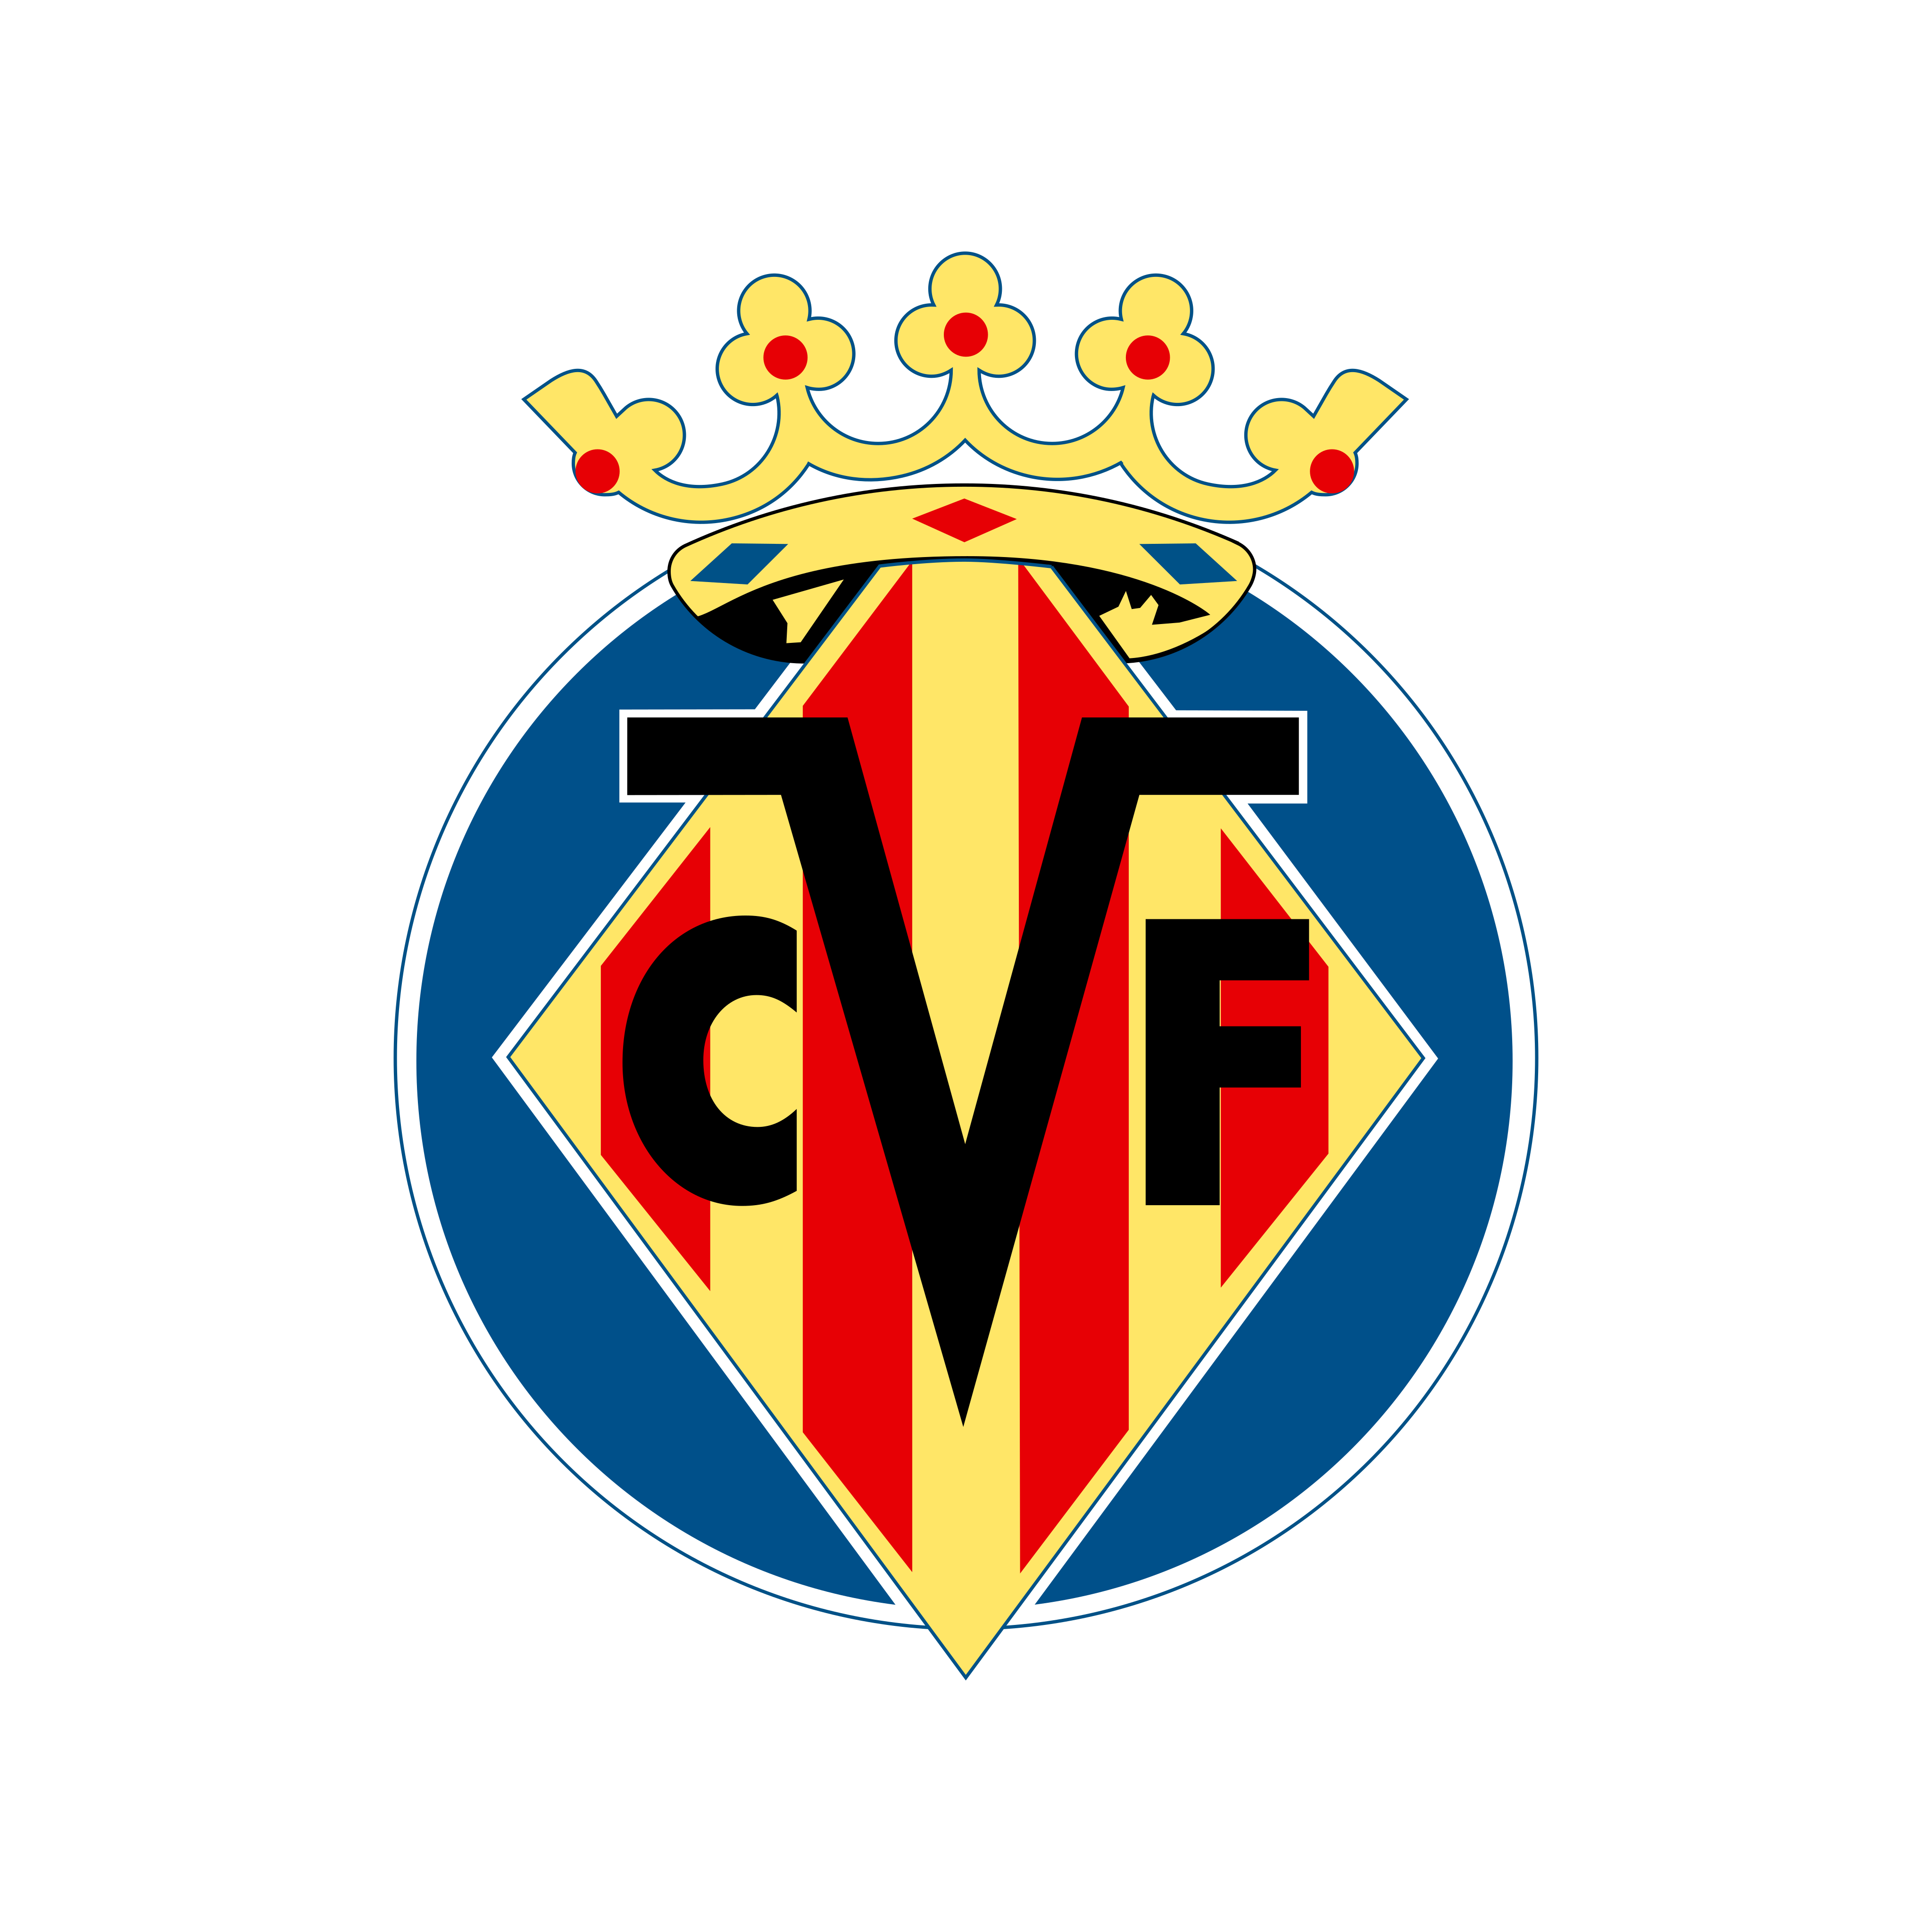 villarreal cf logo 0 - Villarreal CF Logo